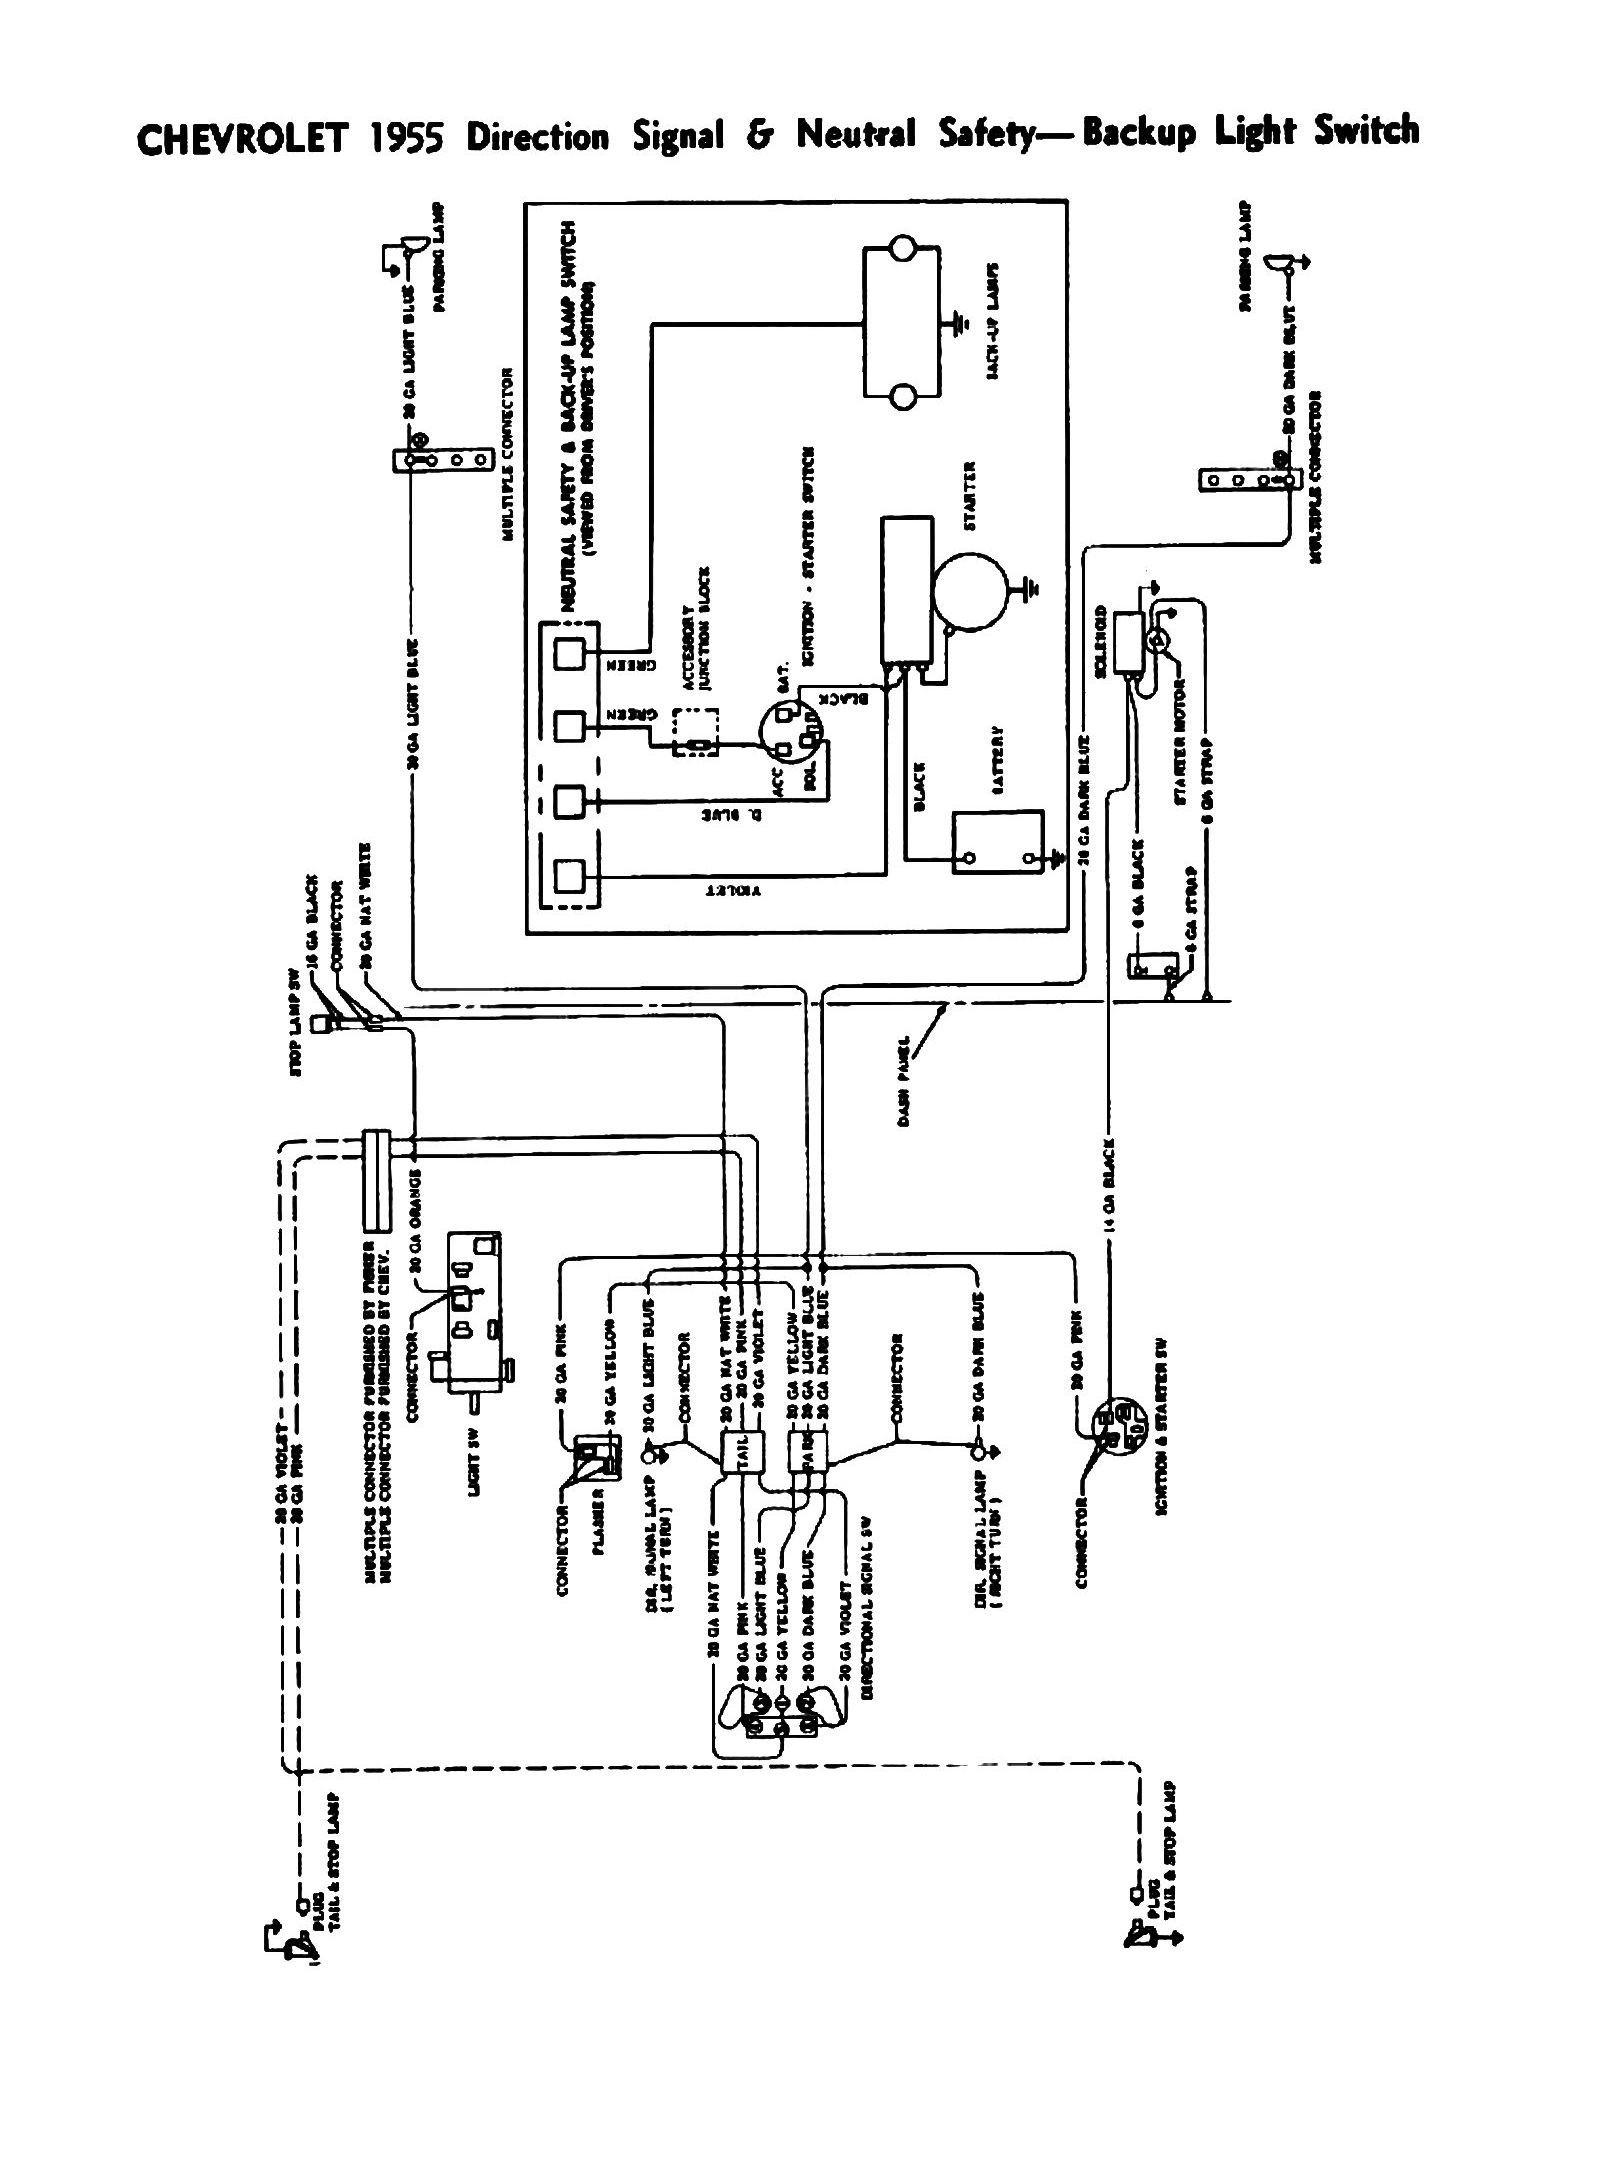 wiring diagram for neutral safety switch gm wire center u2022 rh haxtech cc